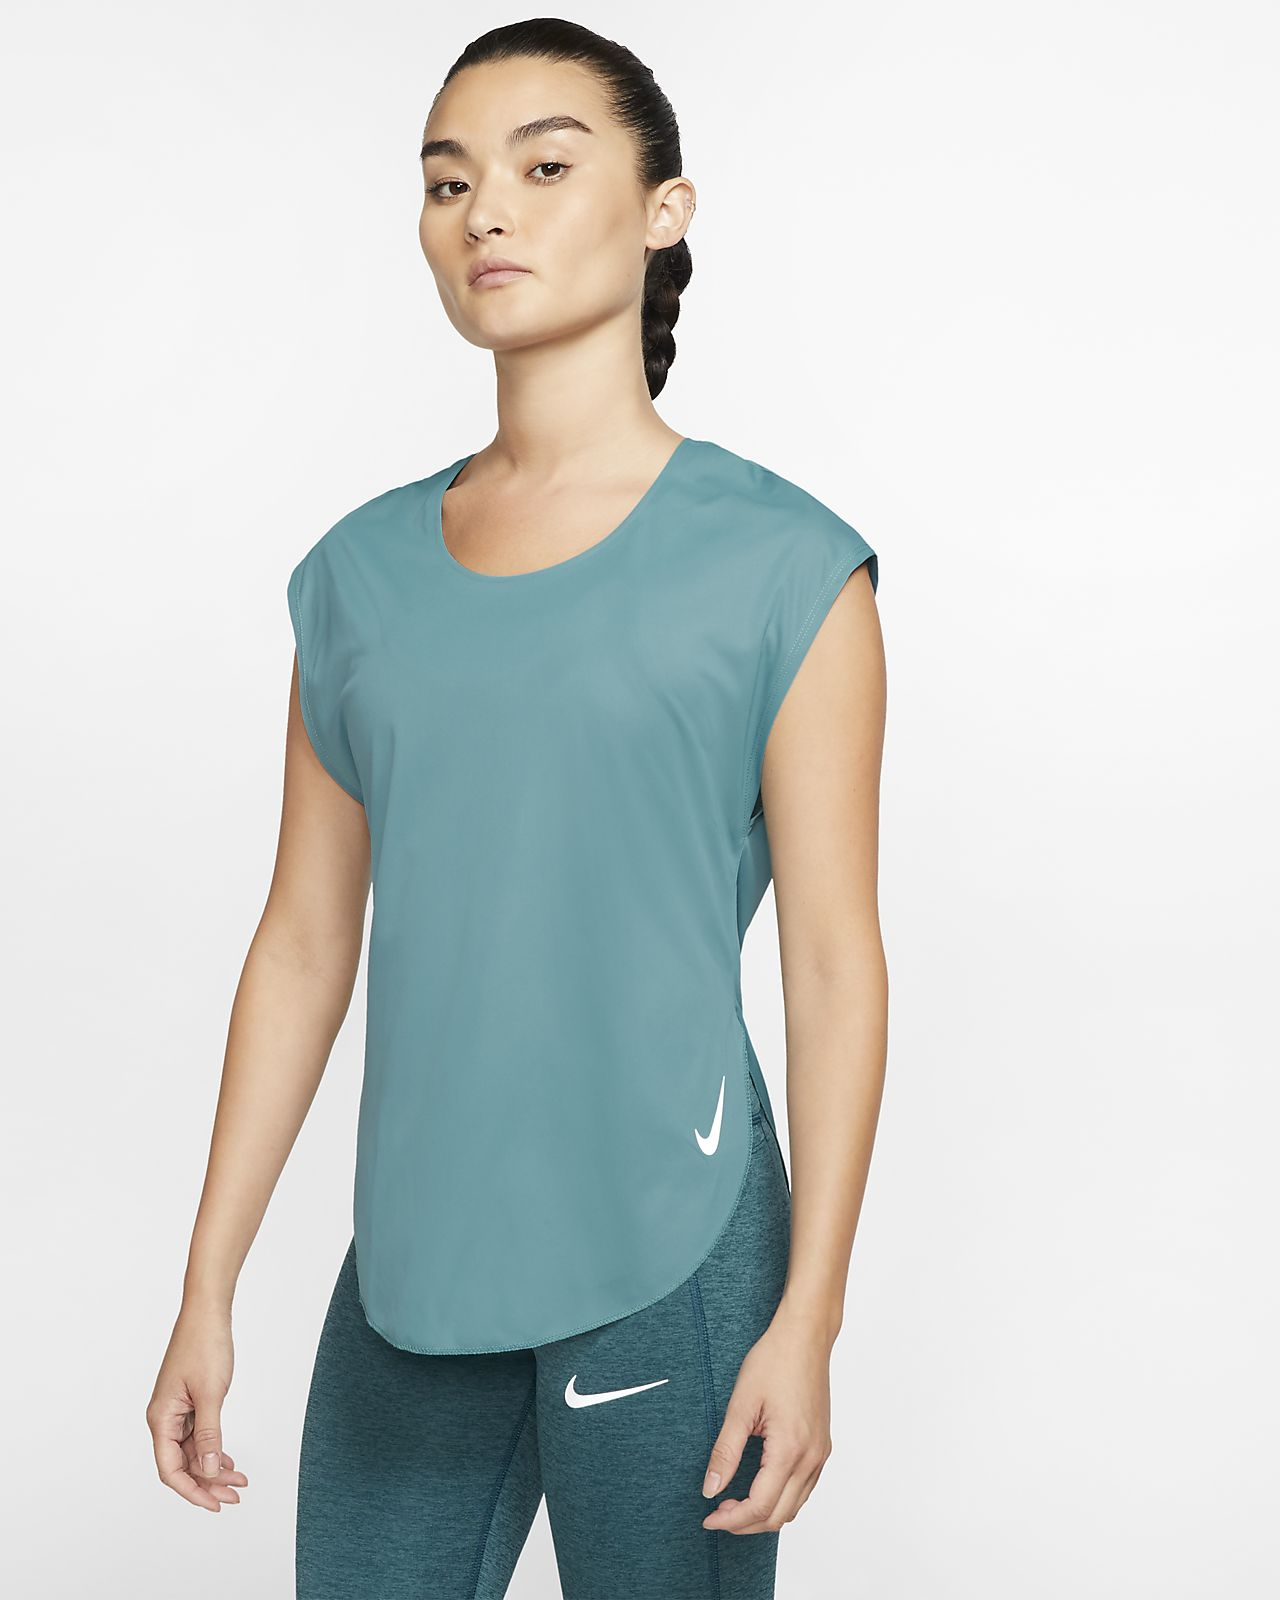 Prenda superior de running para mujer Nike City Sleek